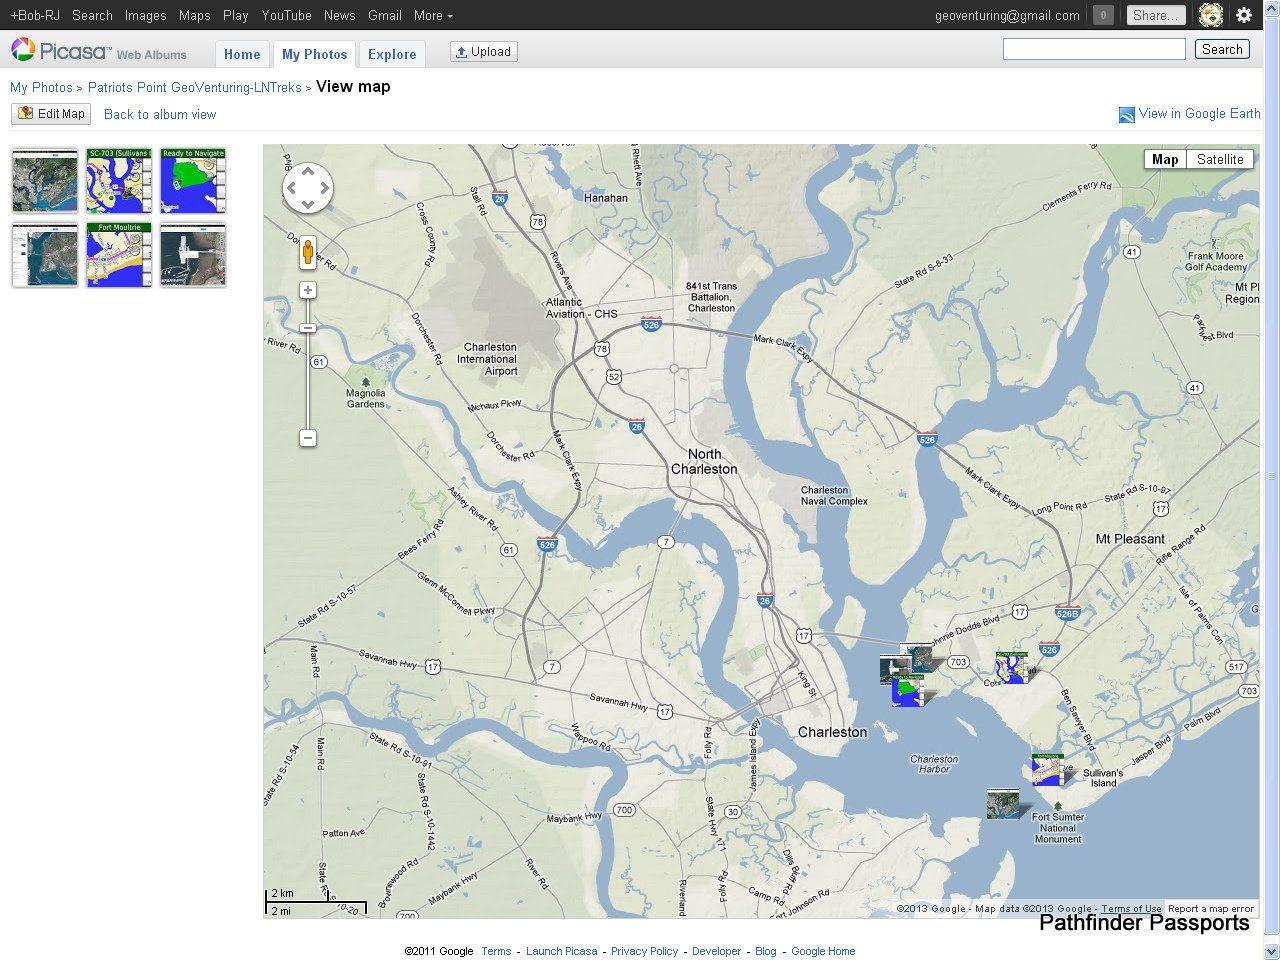 thinkLets / Charleston Harbor NCAPS BioGeography mapXchange CHSites